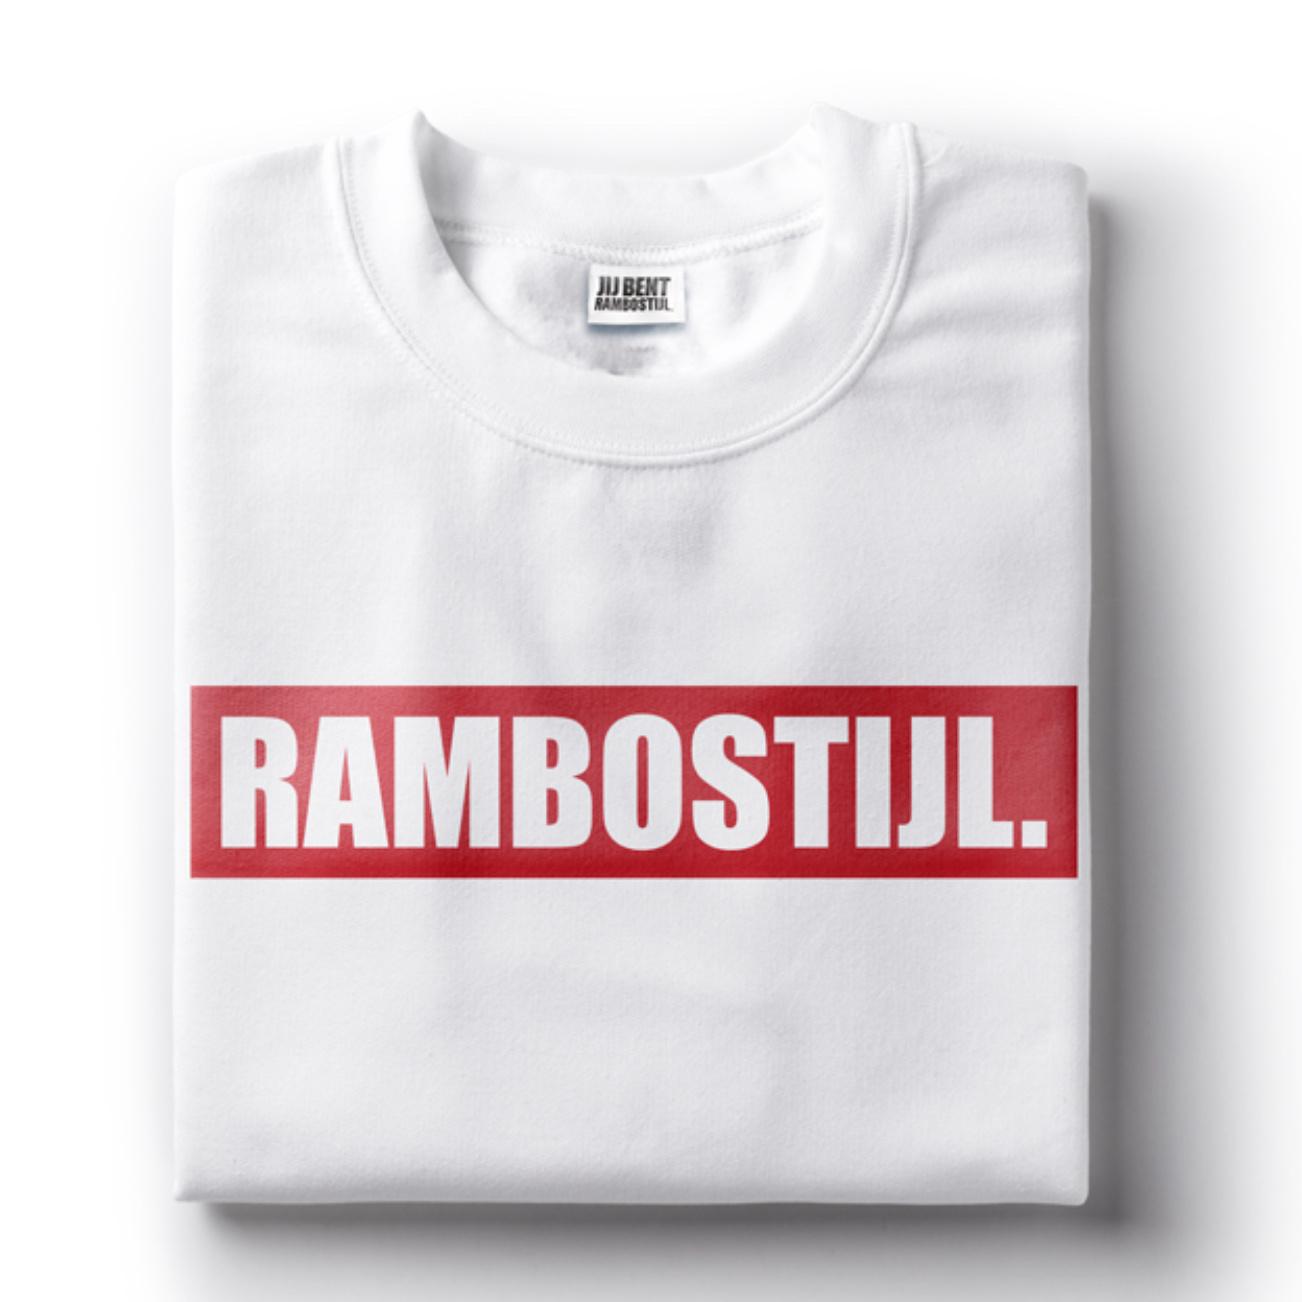 shirt Rambostijl in Wit